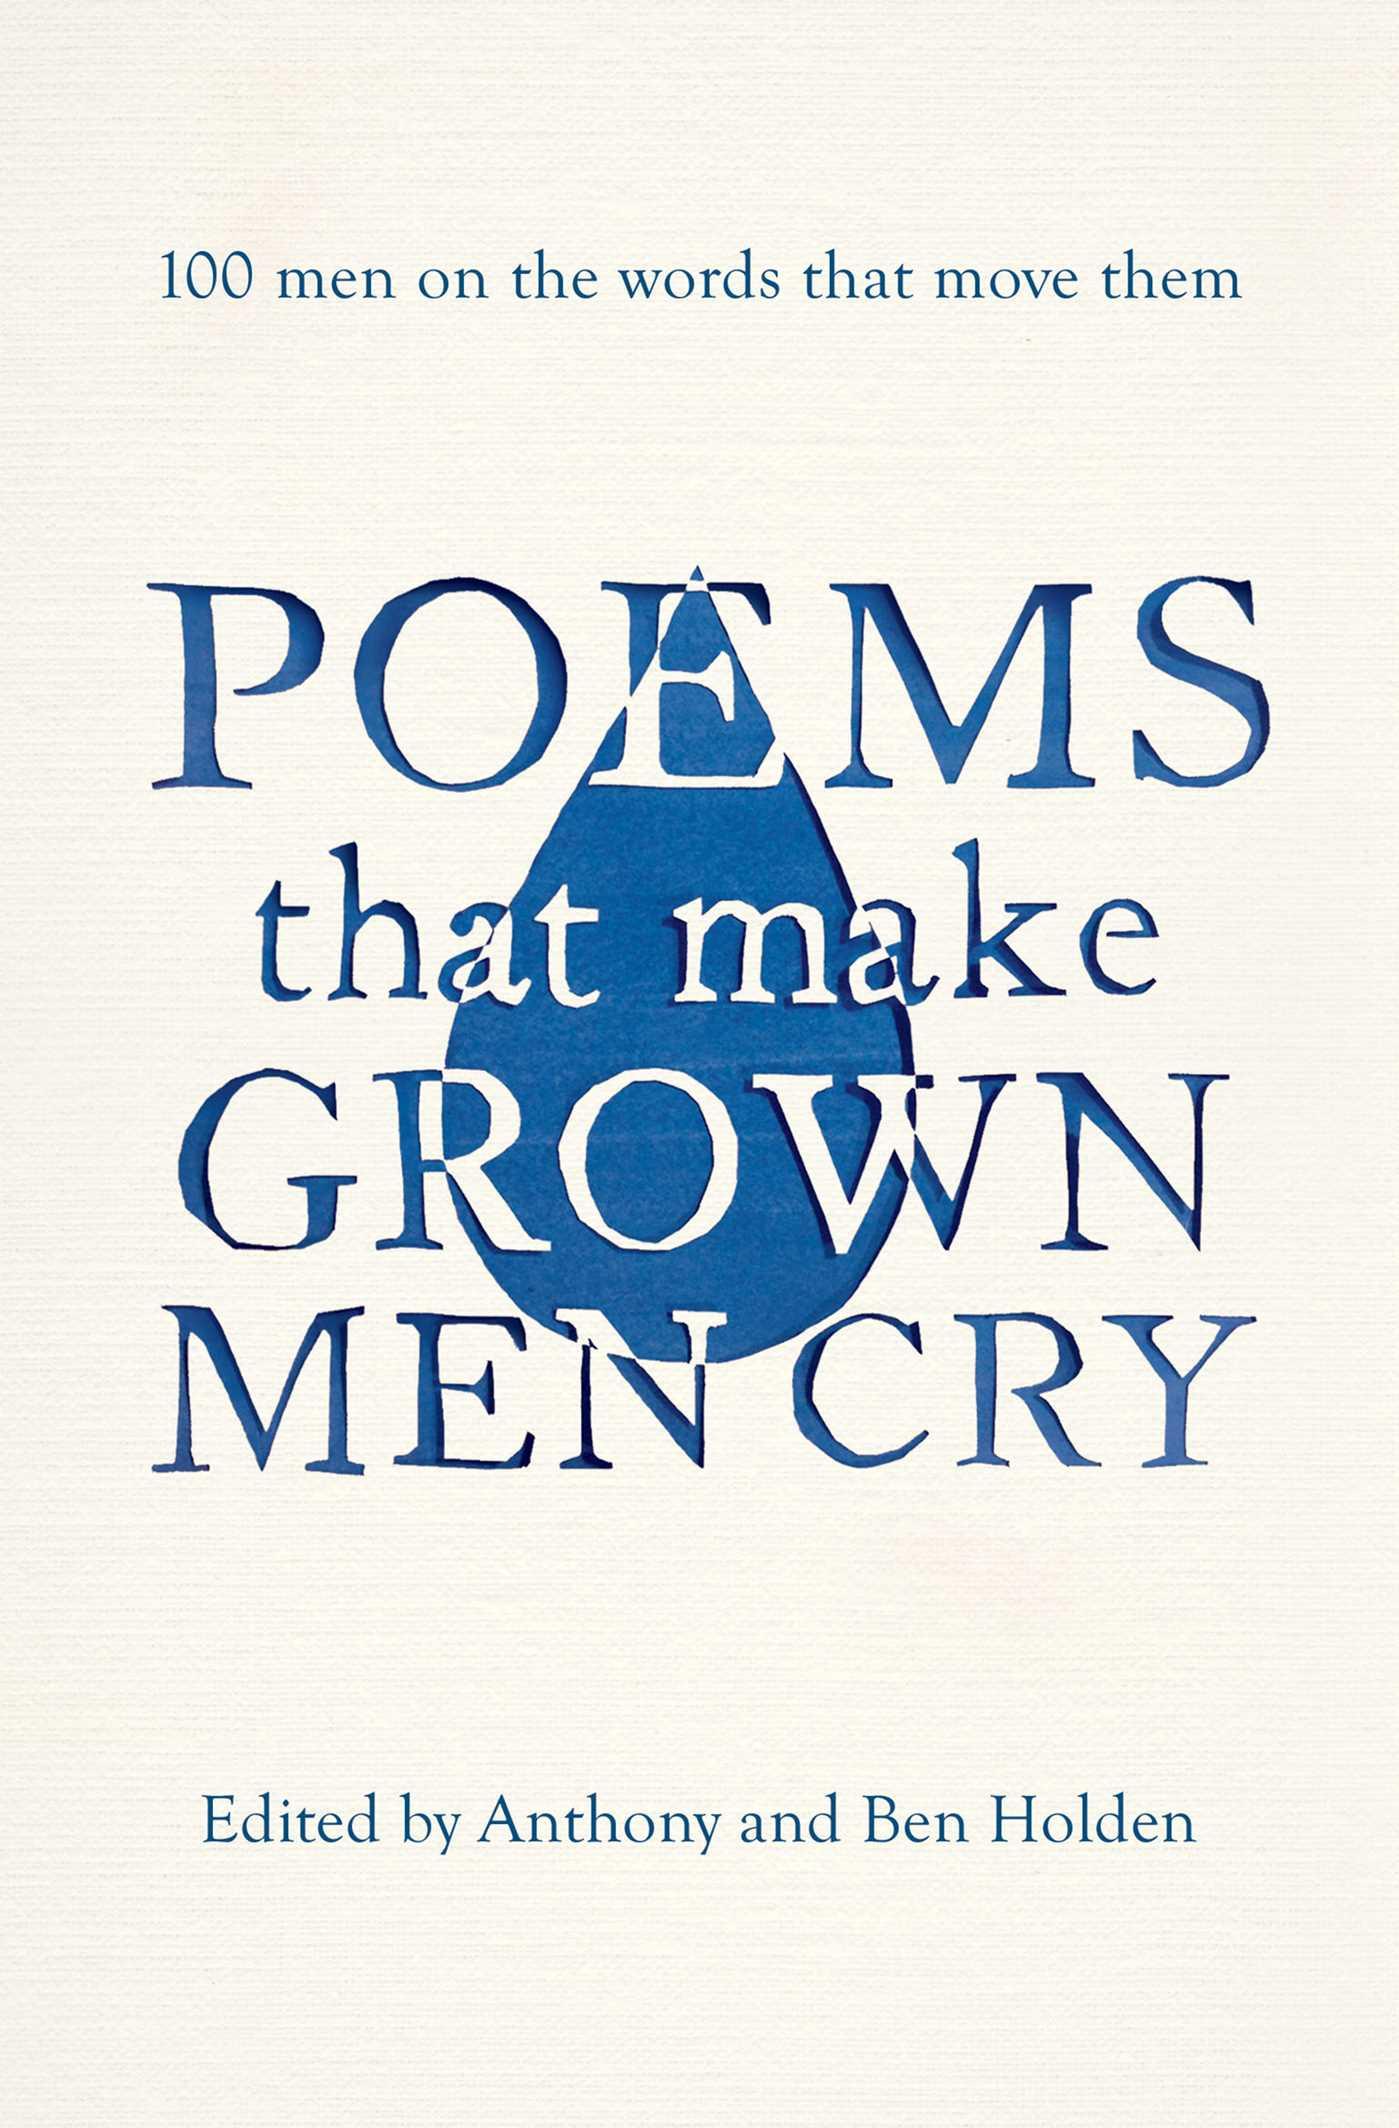 Poems that make grown men cry 9781471134913 hr